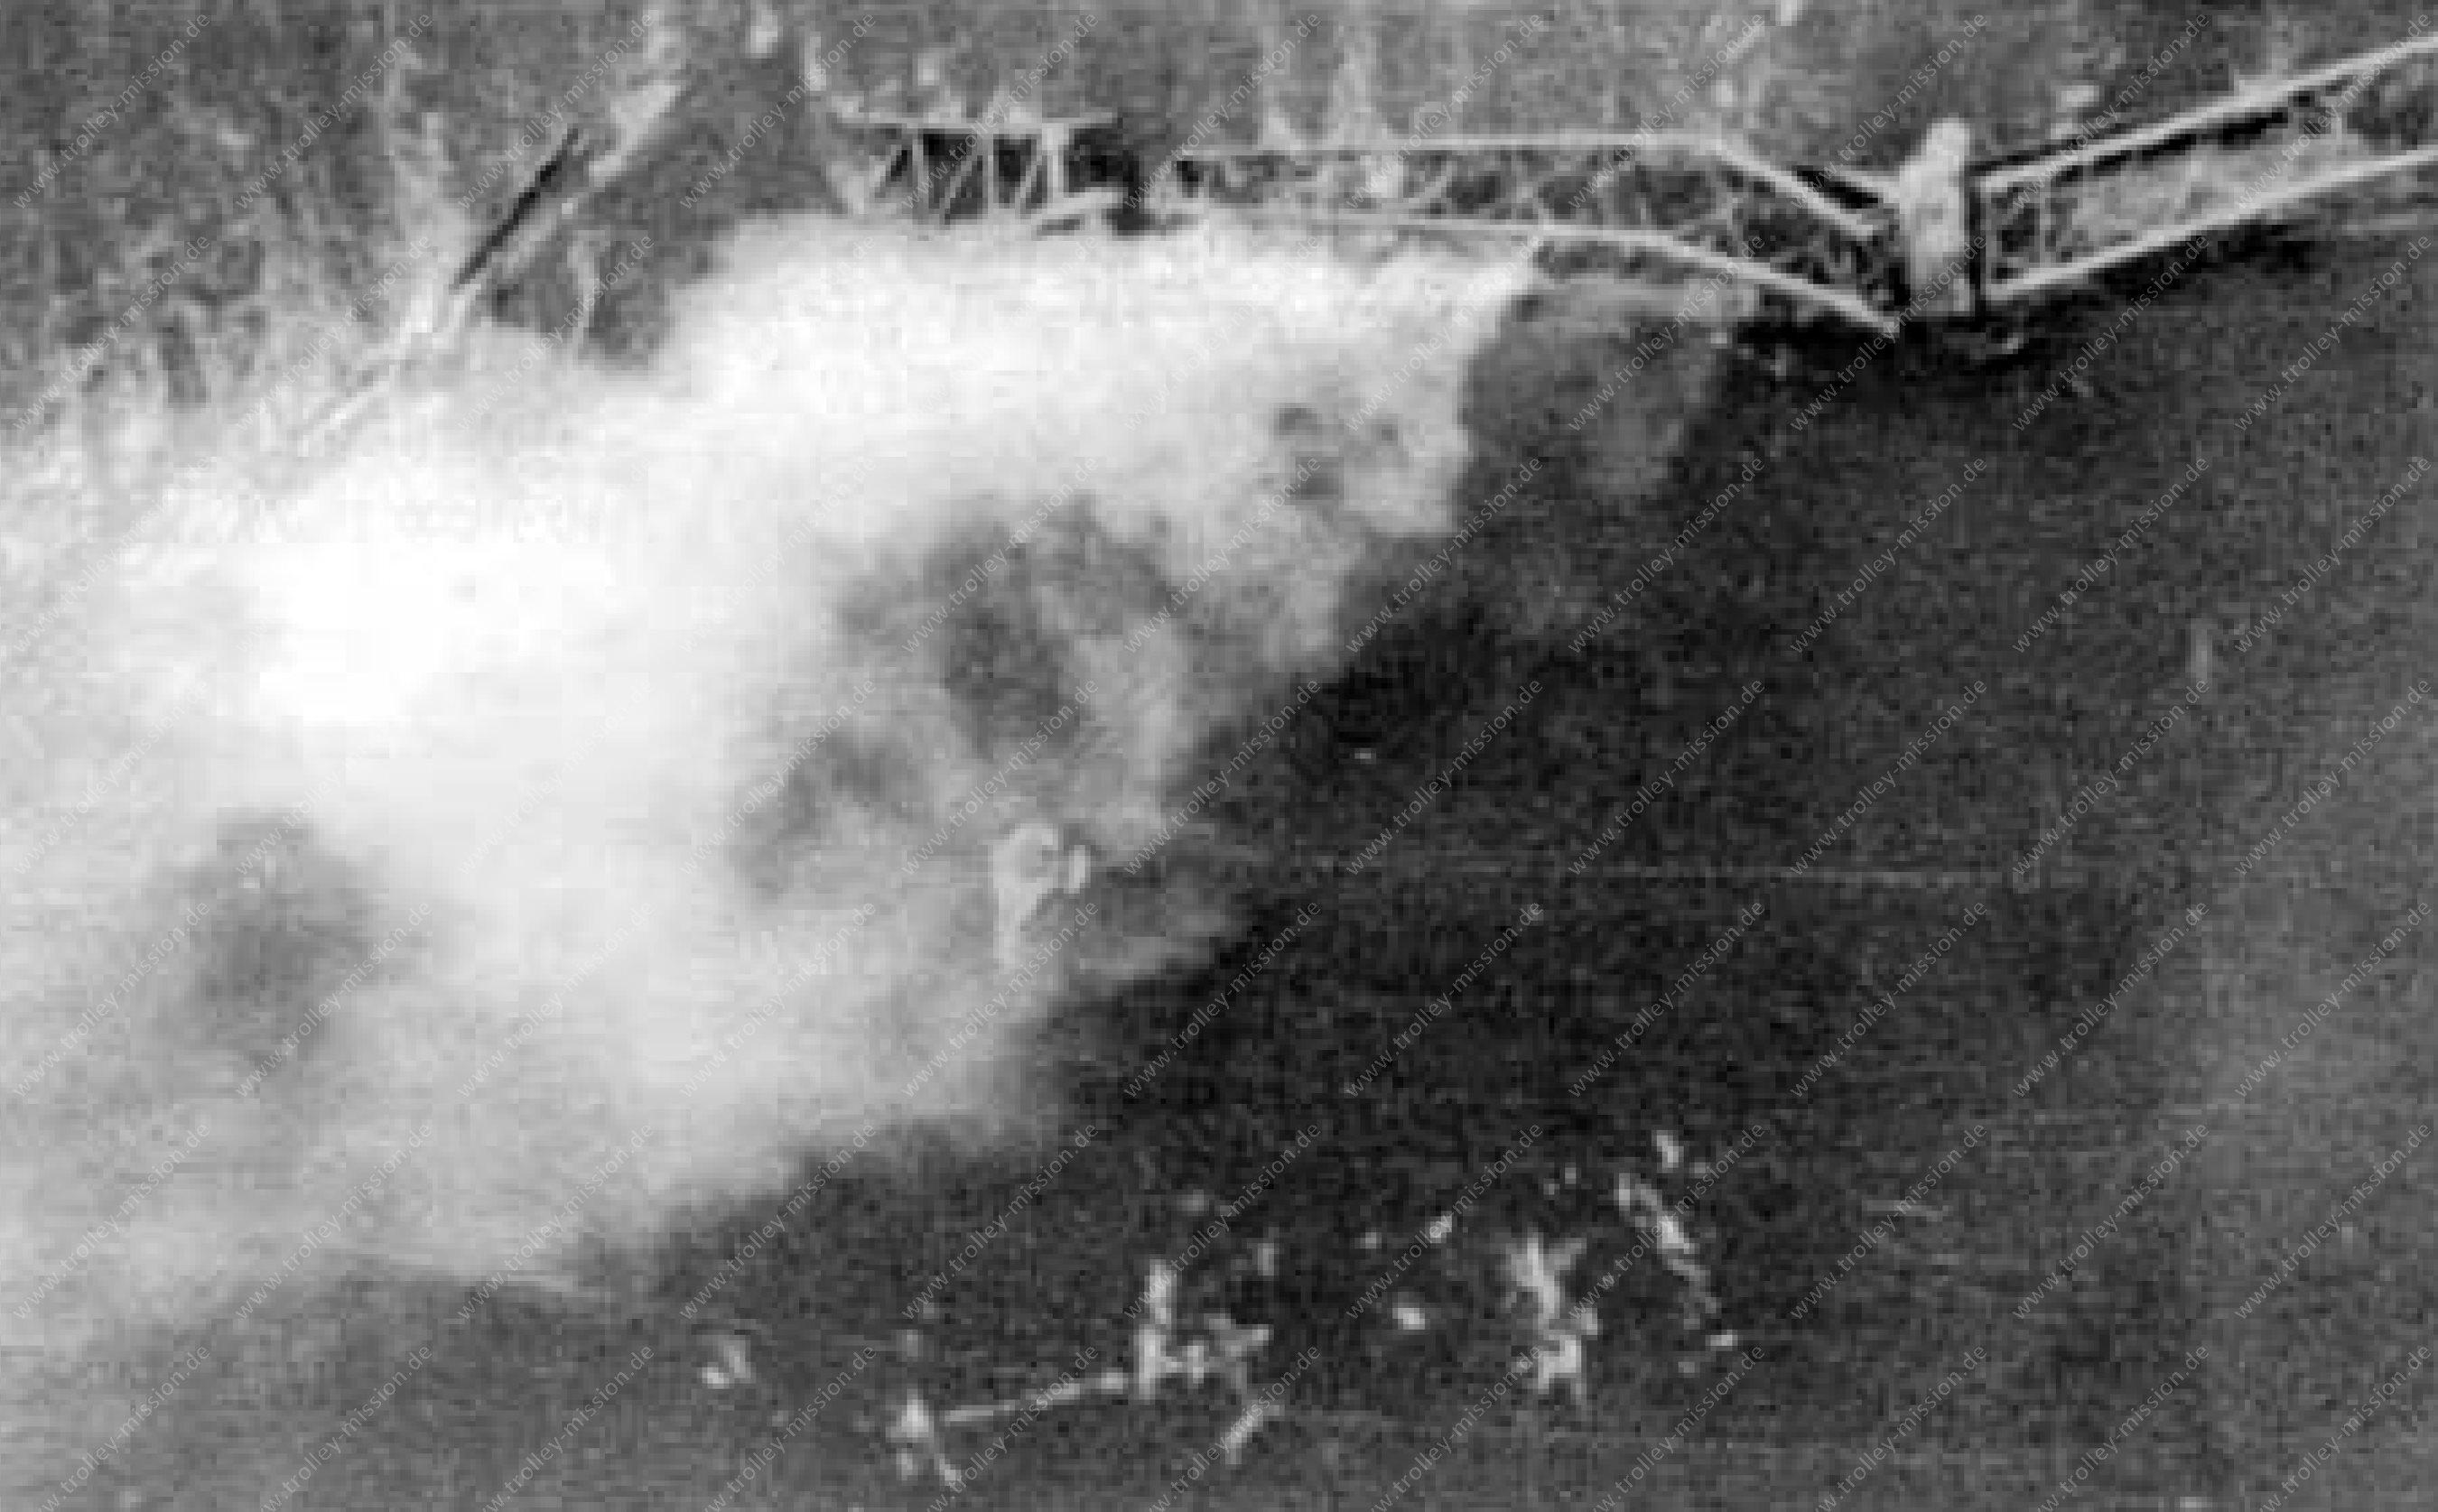 Airplane crash during the Trolley Mission near Neuwied at the Urmitzer Railway Bridge